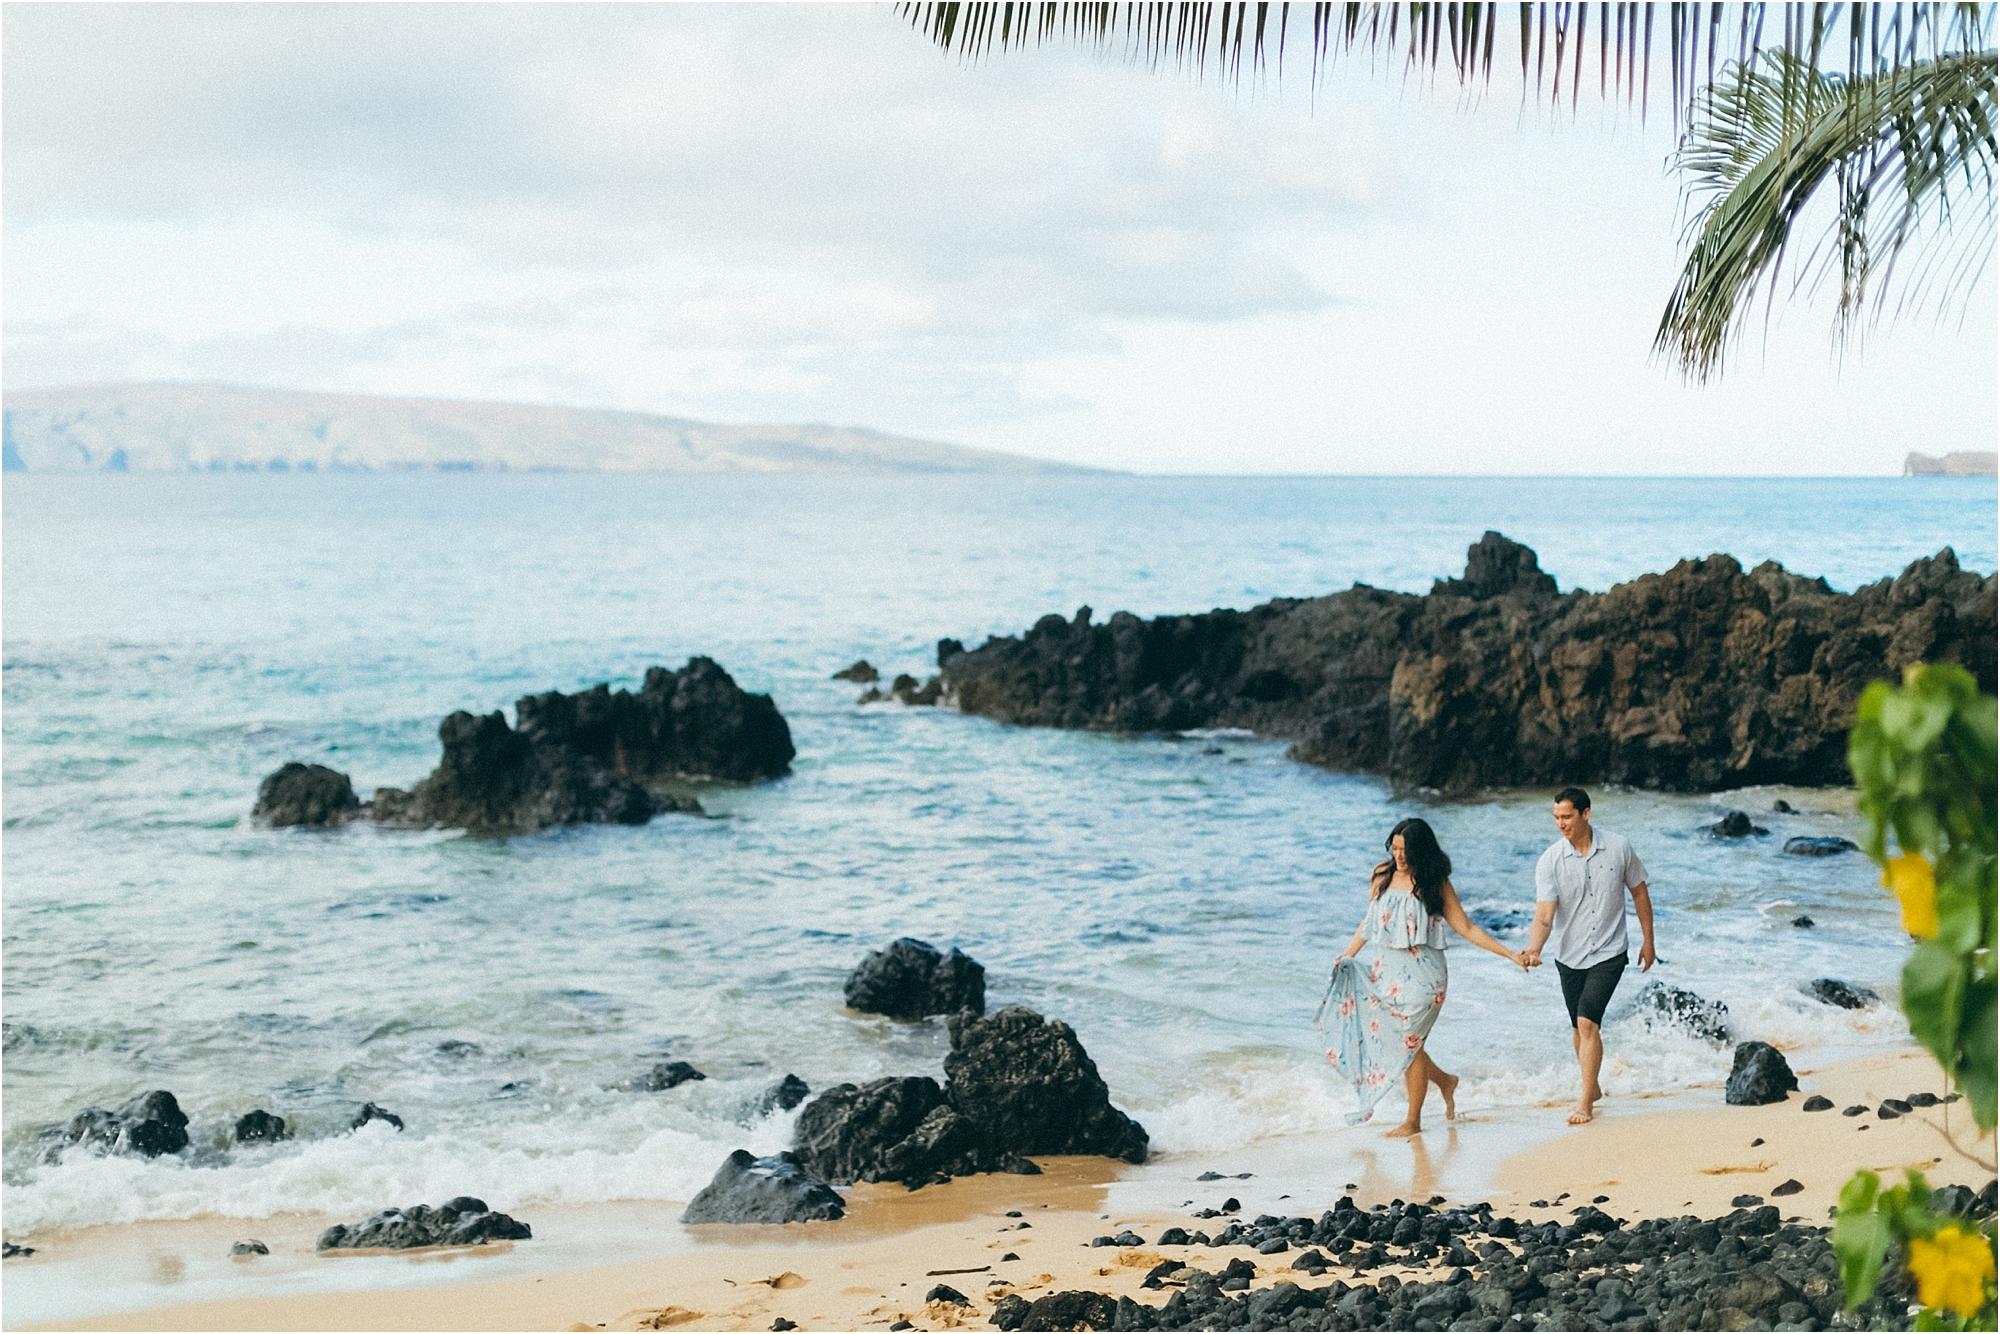 angie-diaz-photography-maui-hawaii-engagement-wedding-photographer_0006.jpg